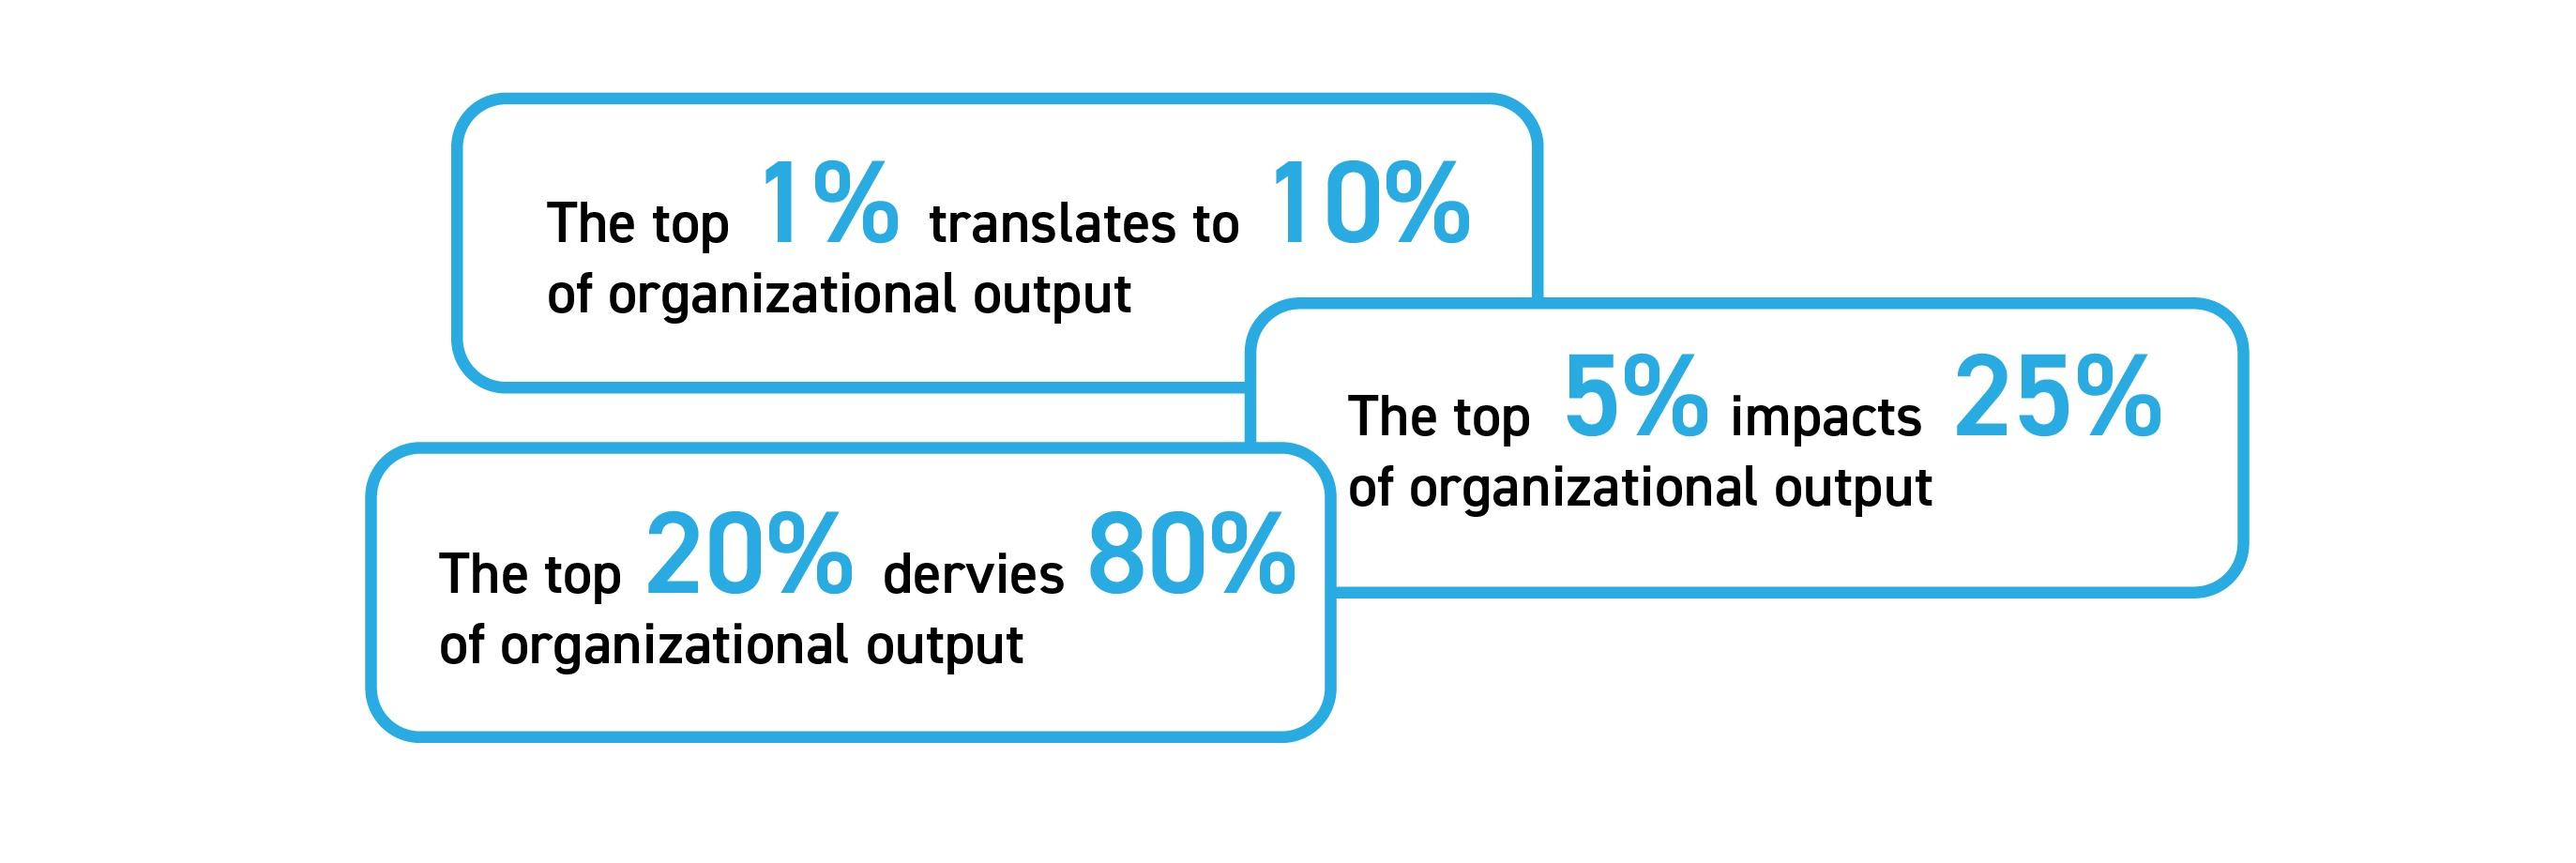 info-organisation-output